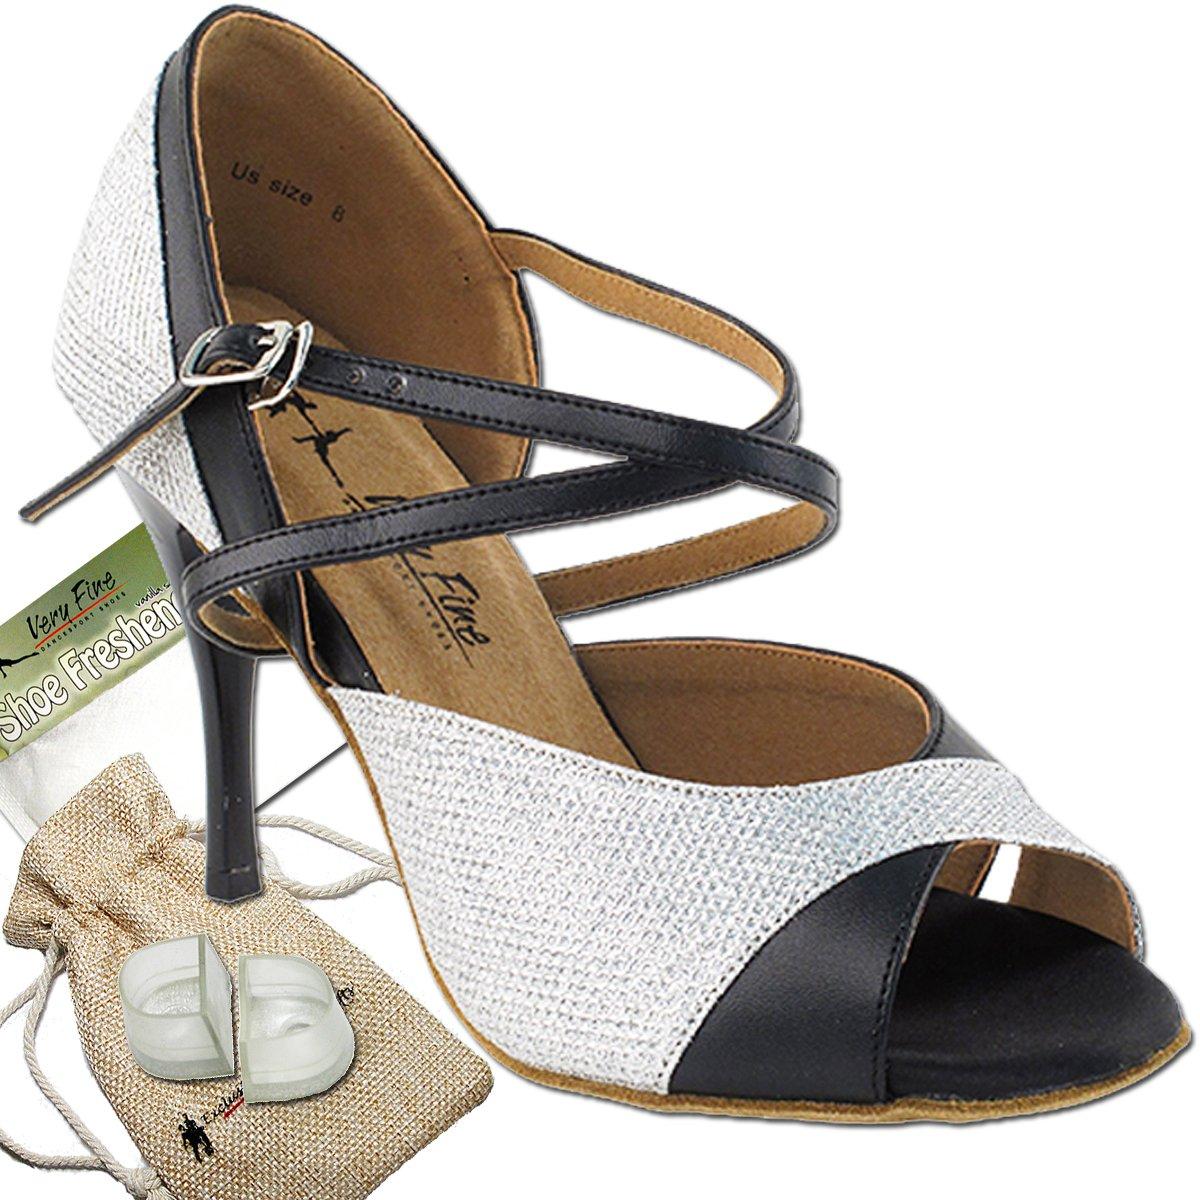 [Very Fine Dance Shoes] レディース B0764JZ332 2.75